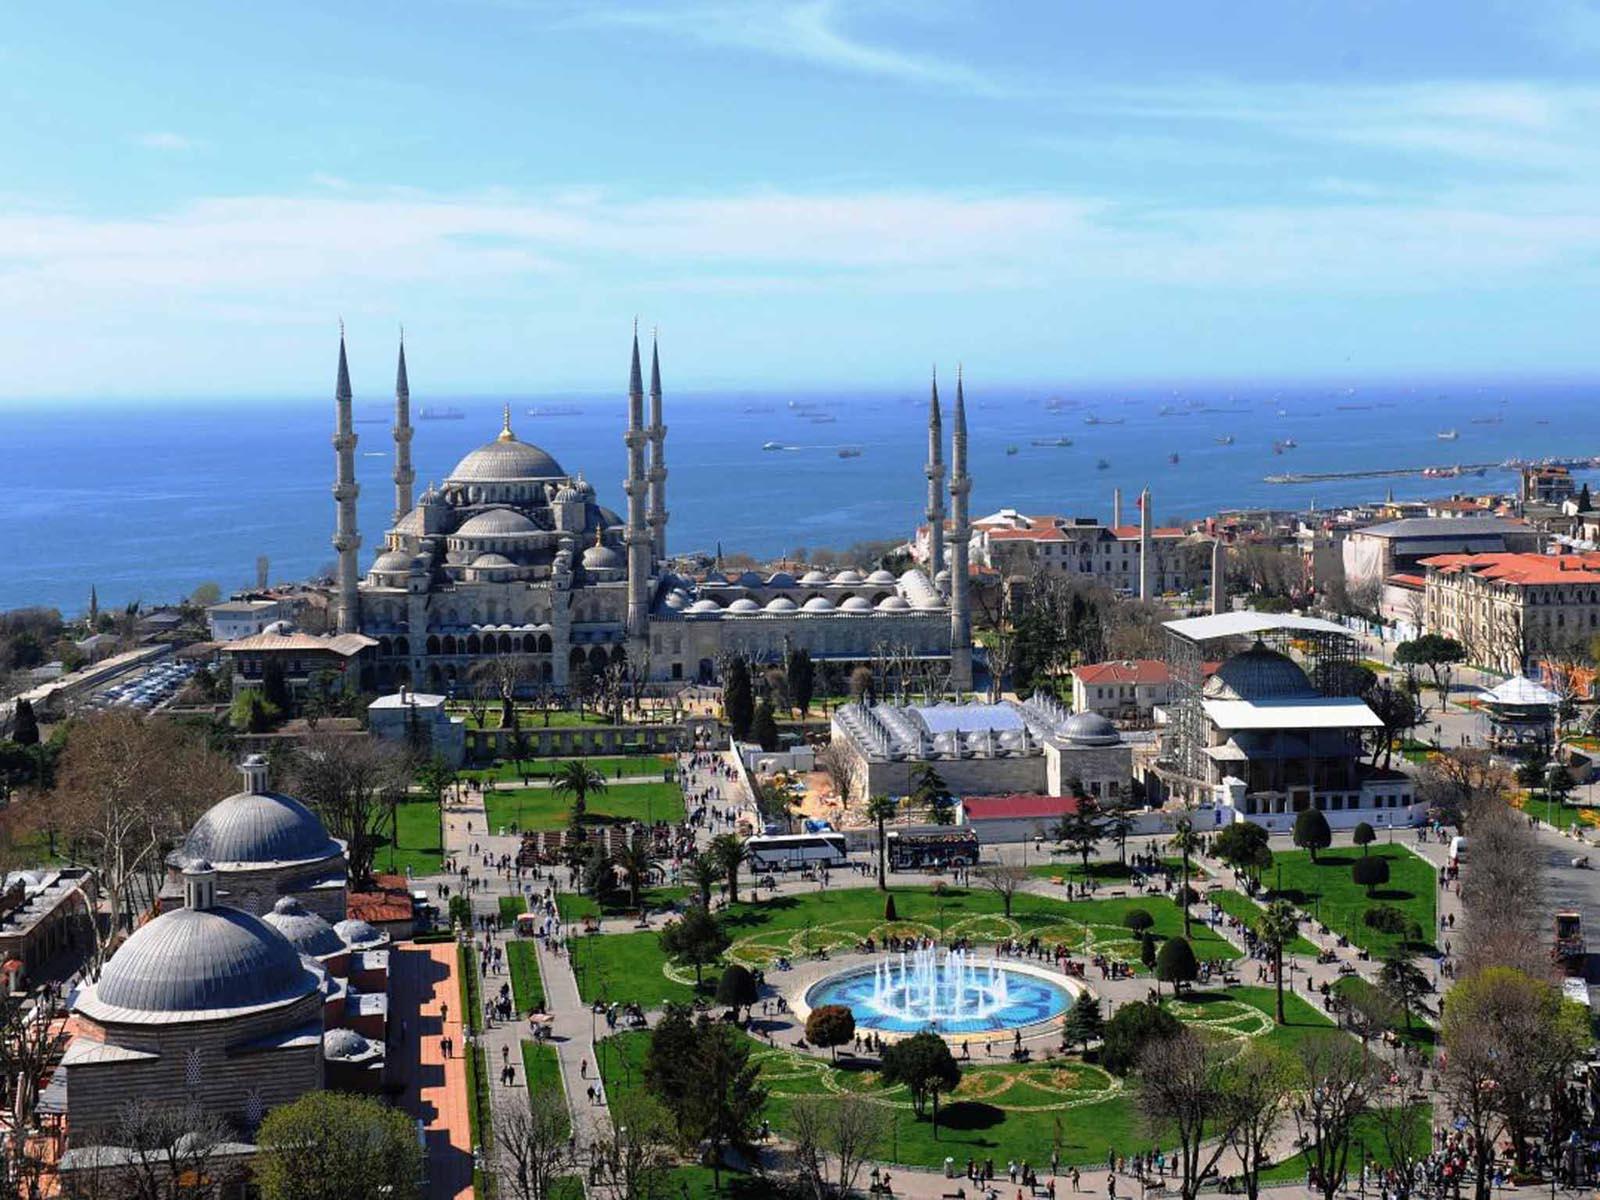 The Blue Mosque Istanburlpress image and creditwww.gototurkey.co.uk